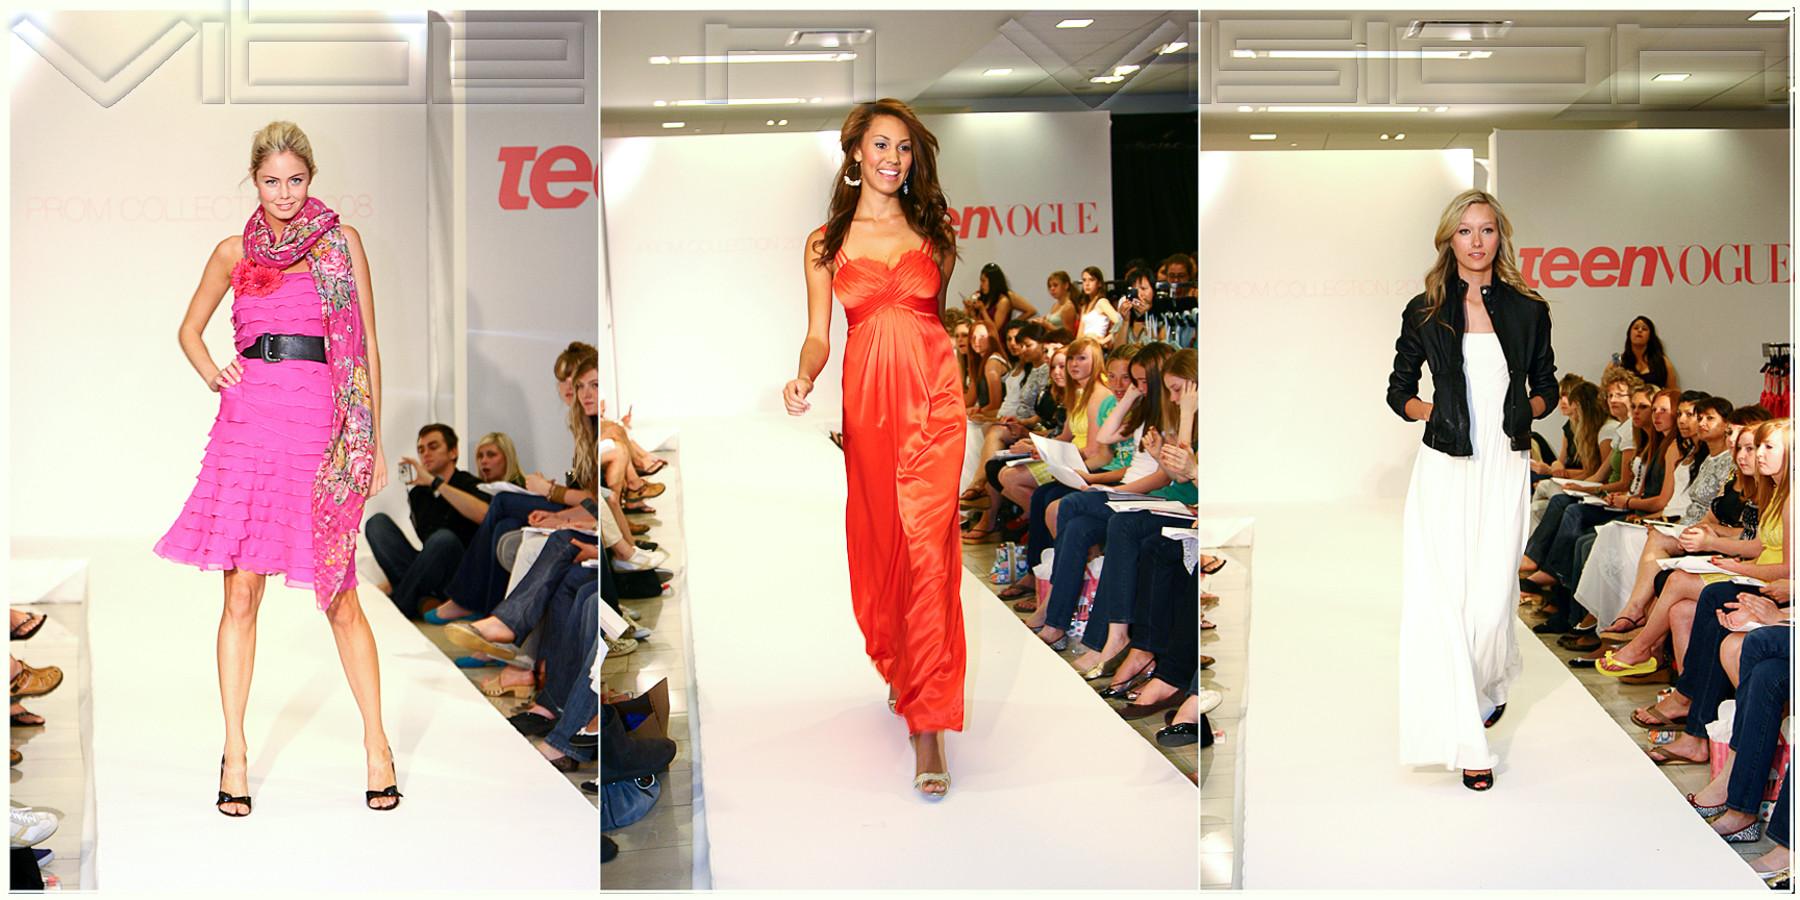 Conde Naste | Teen Vogue